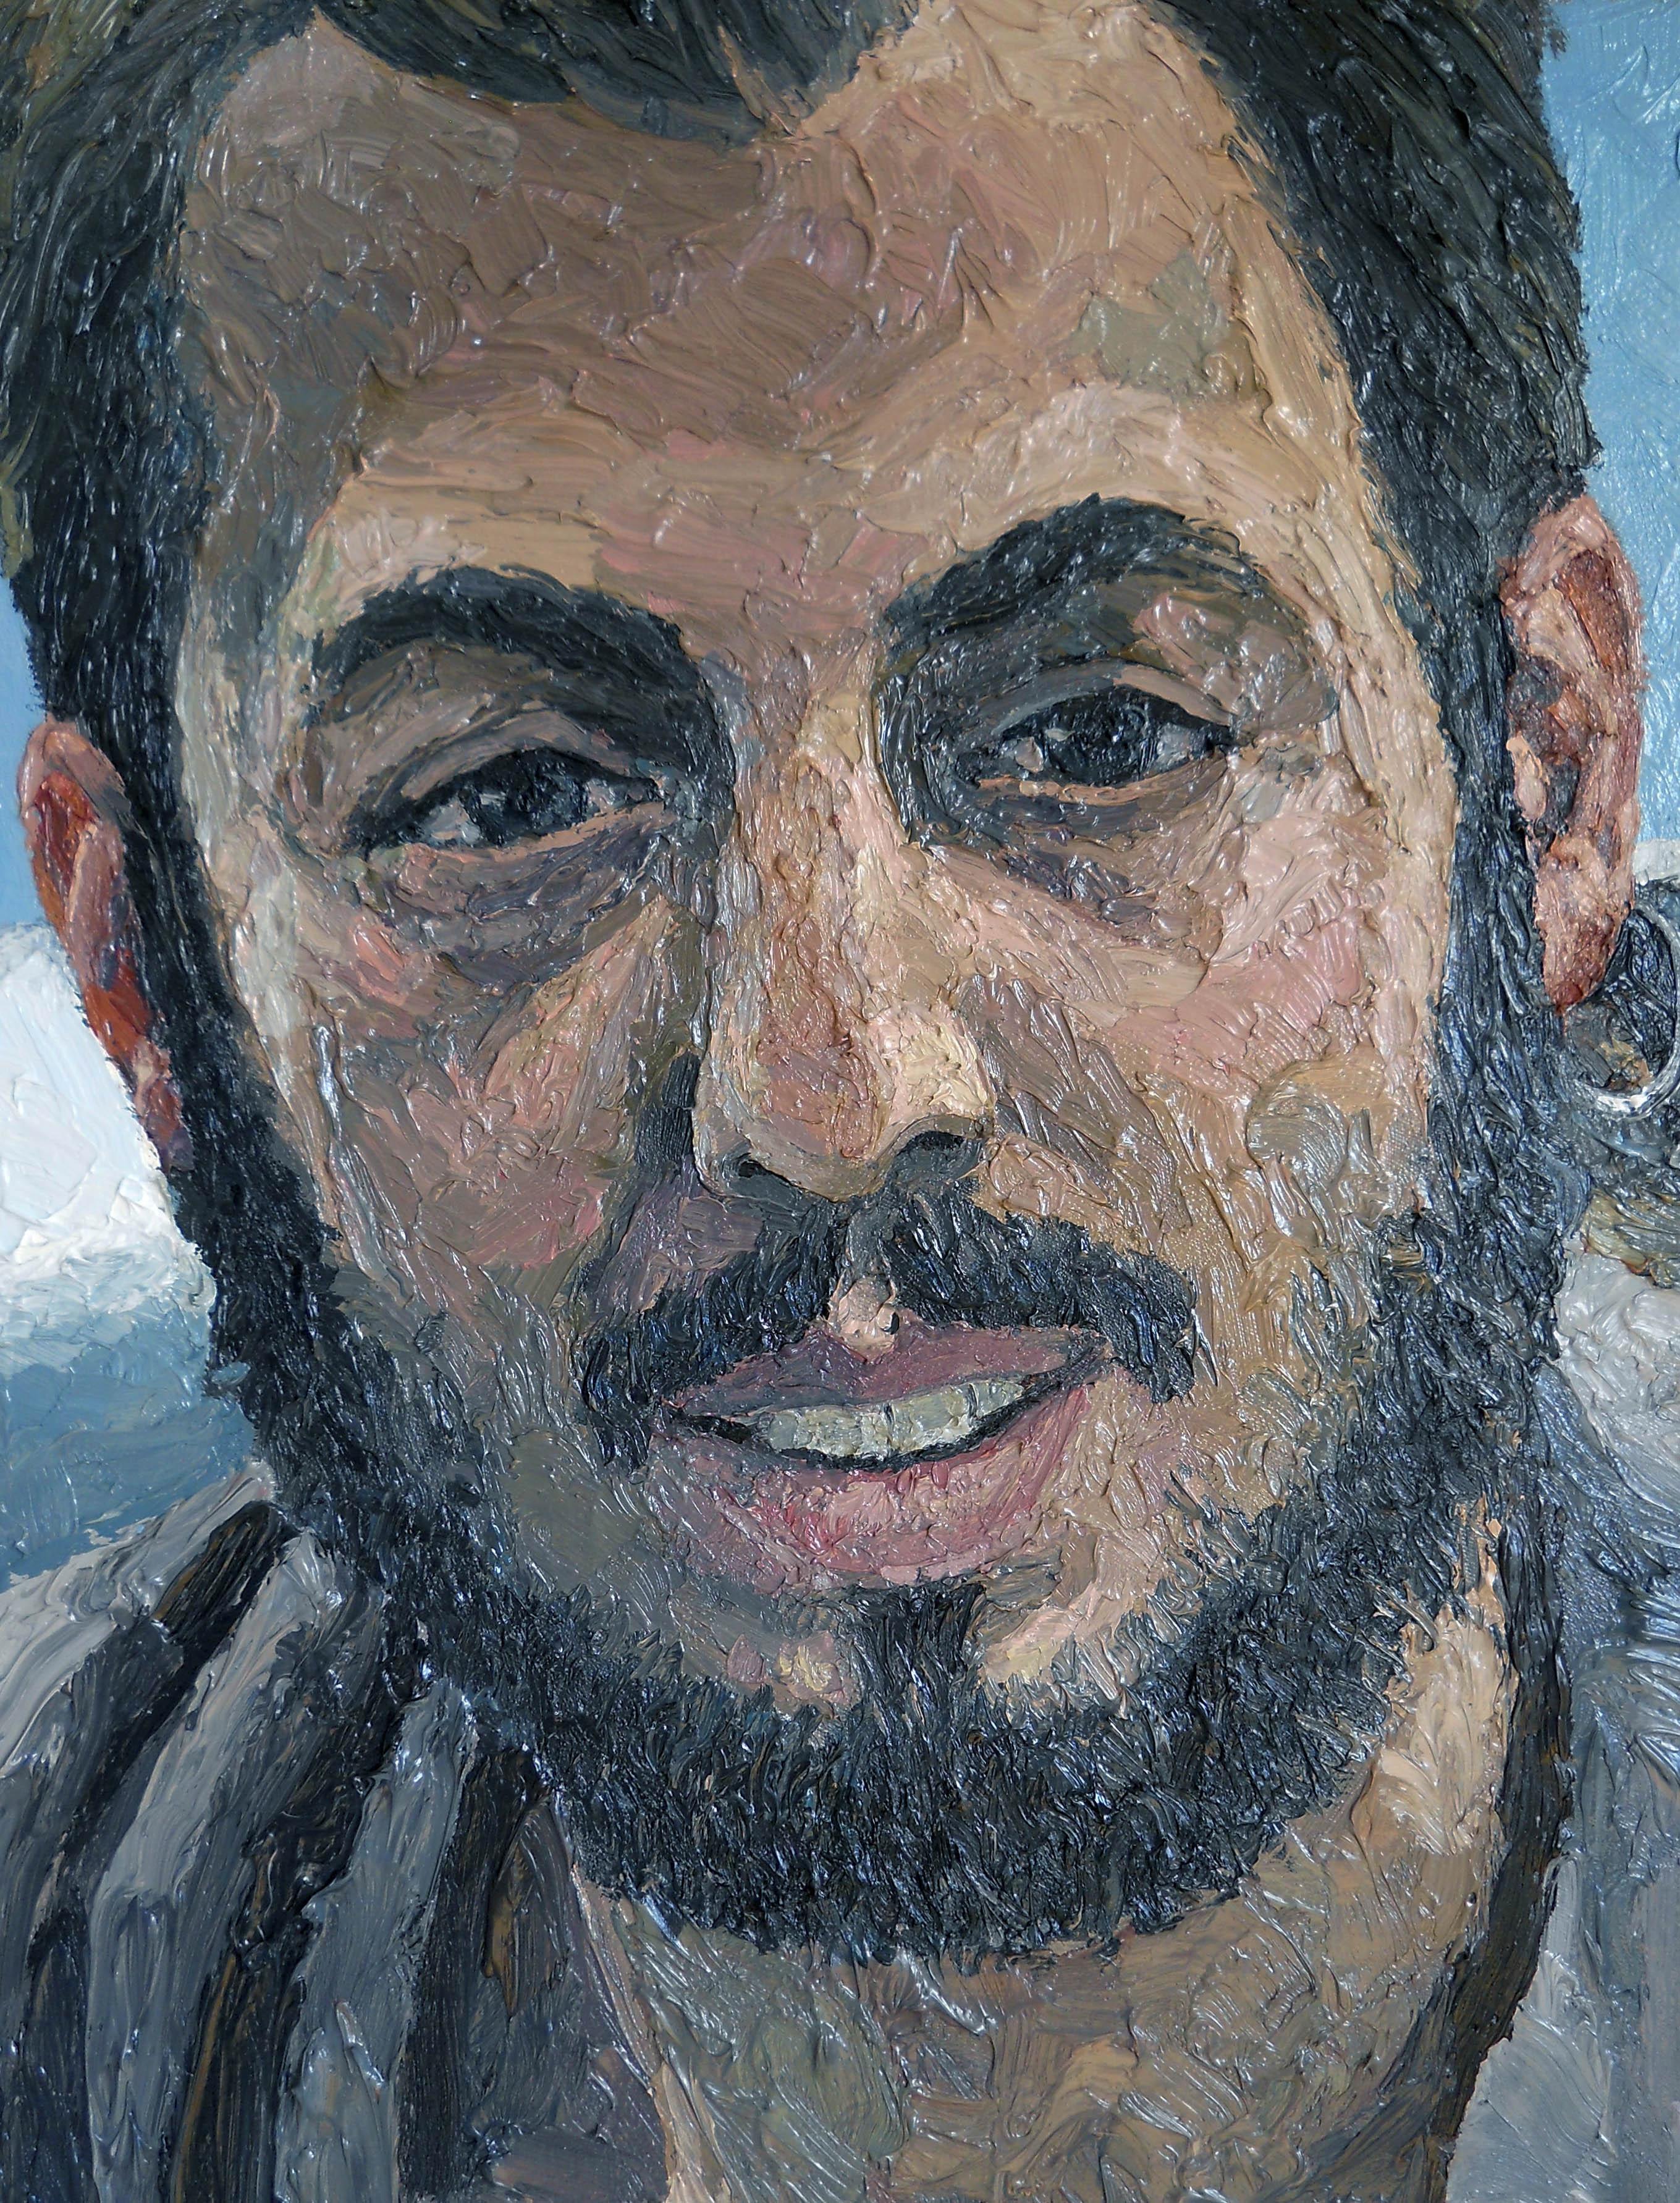 musa ali kösetorunu portrait thick oil painting